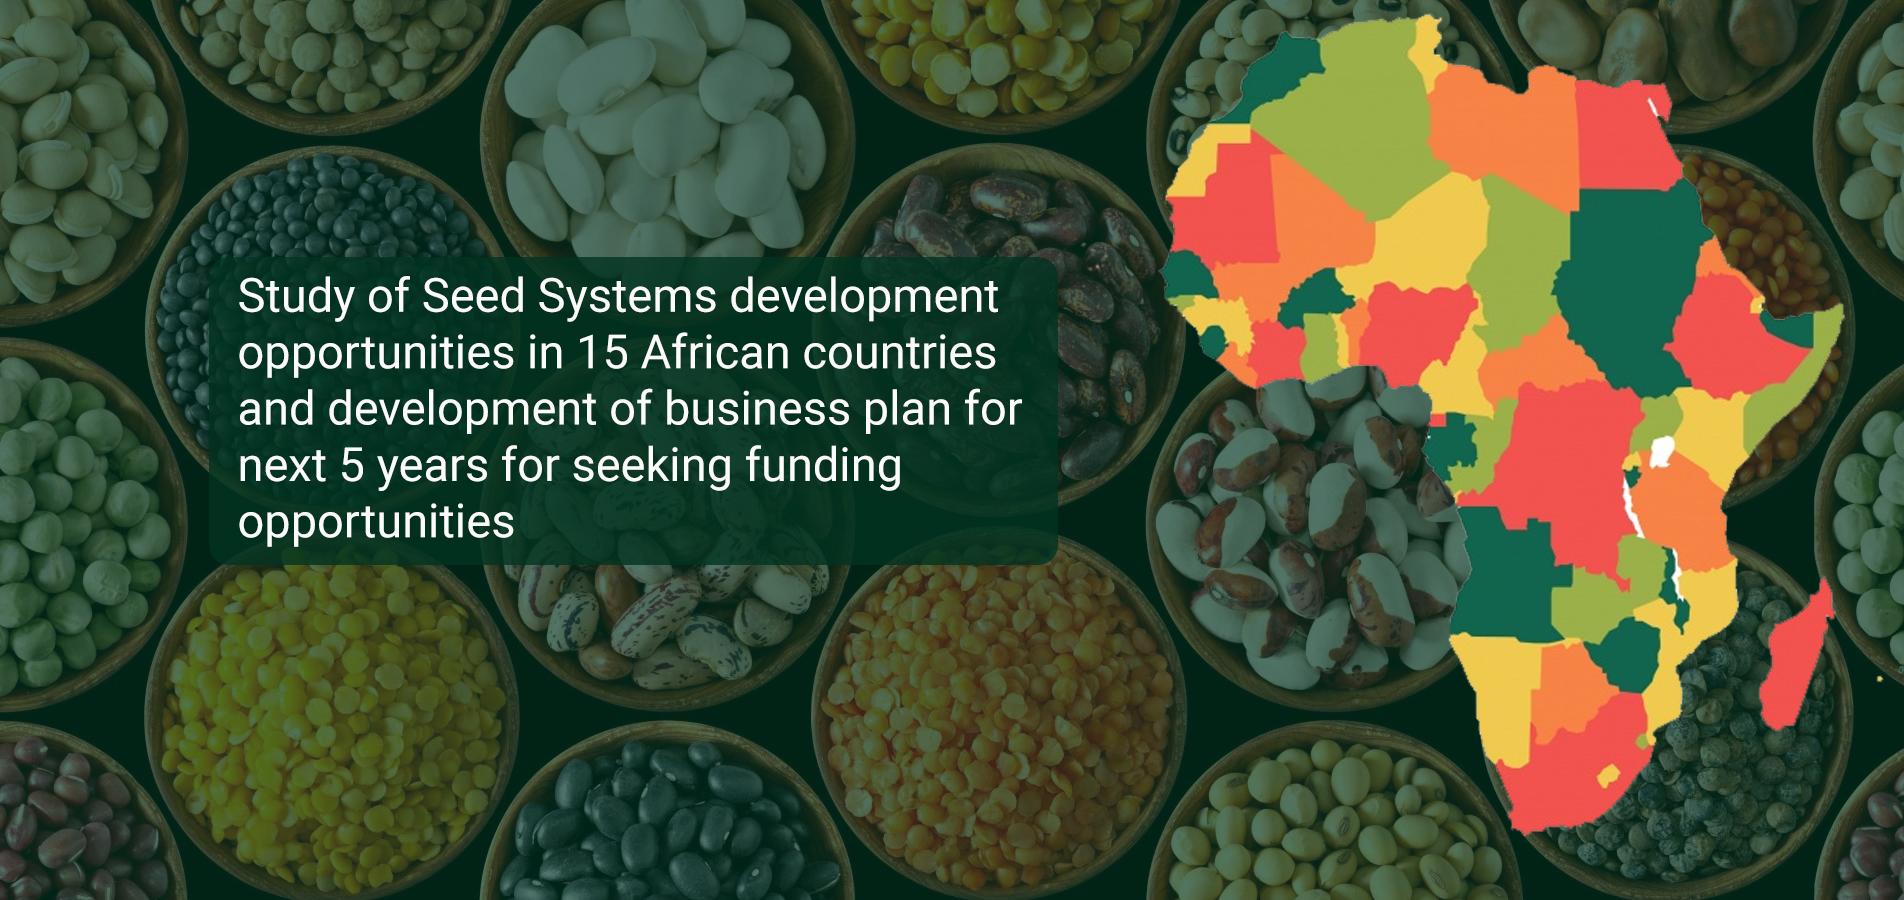 SSG-2020-2025-Business-Plan-Summary